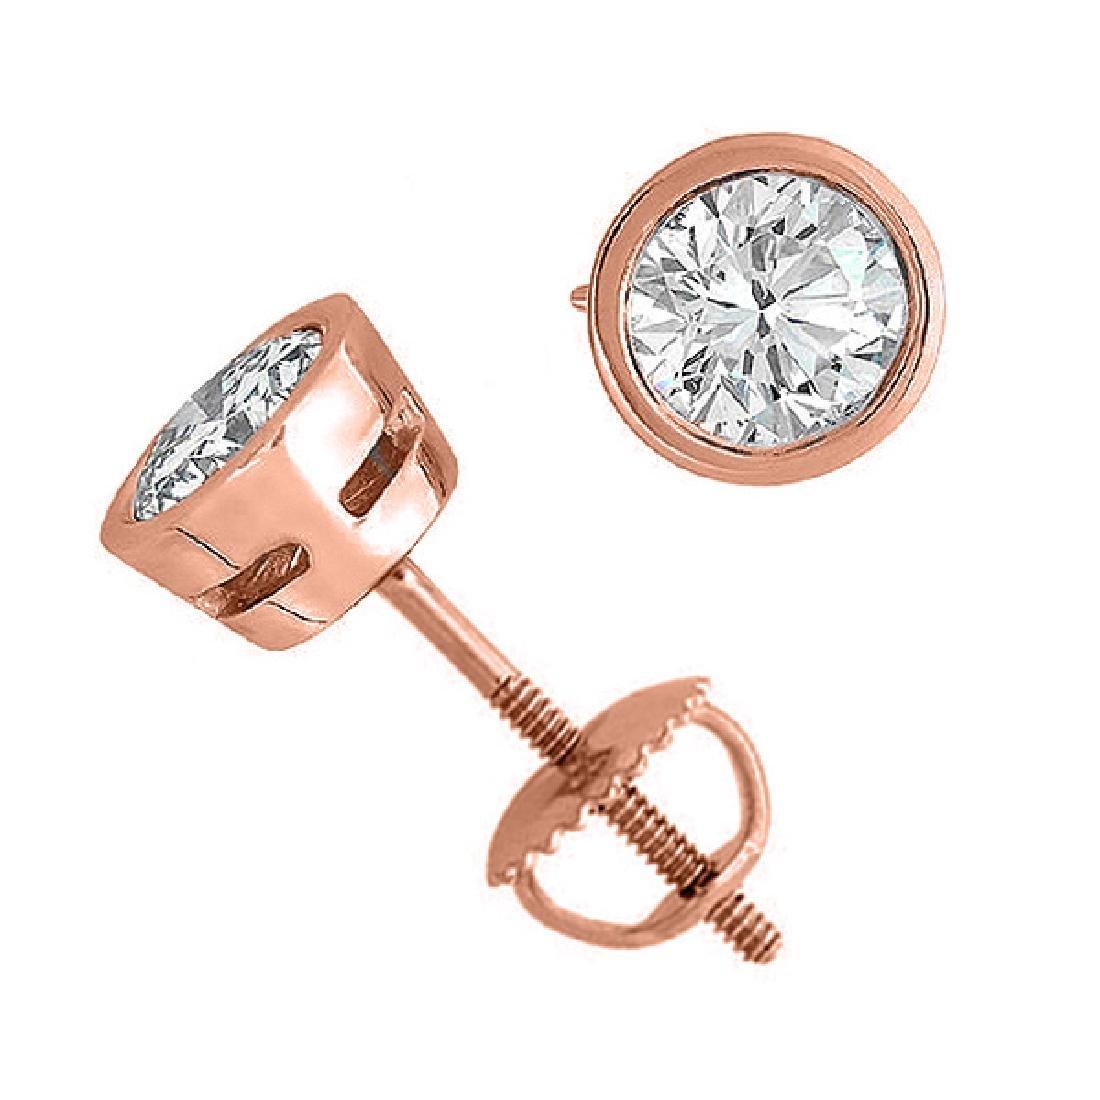 14K Rose Gold 2.05 ctw Natural Diamond Stud Earrings -